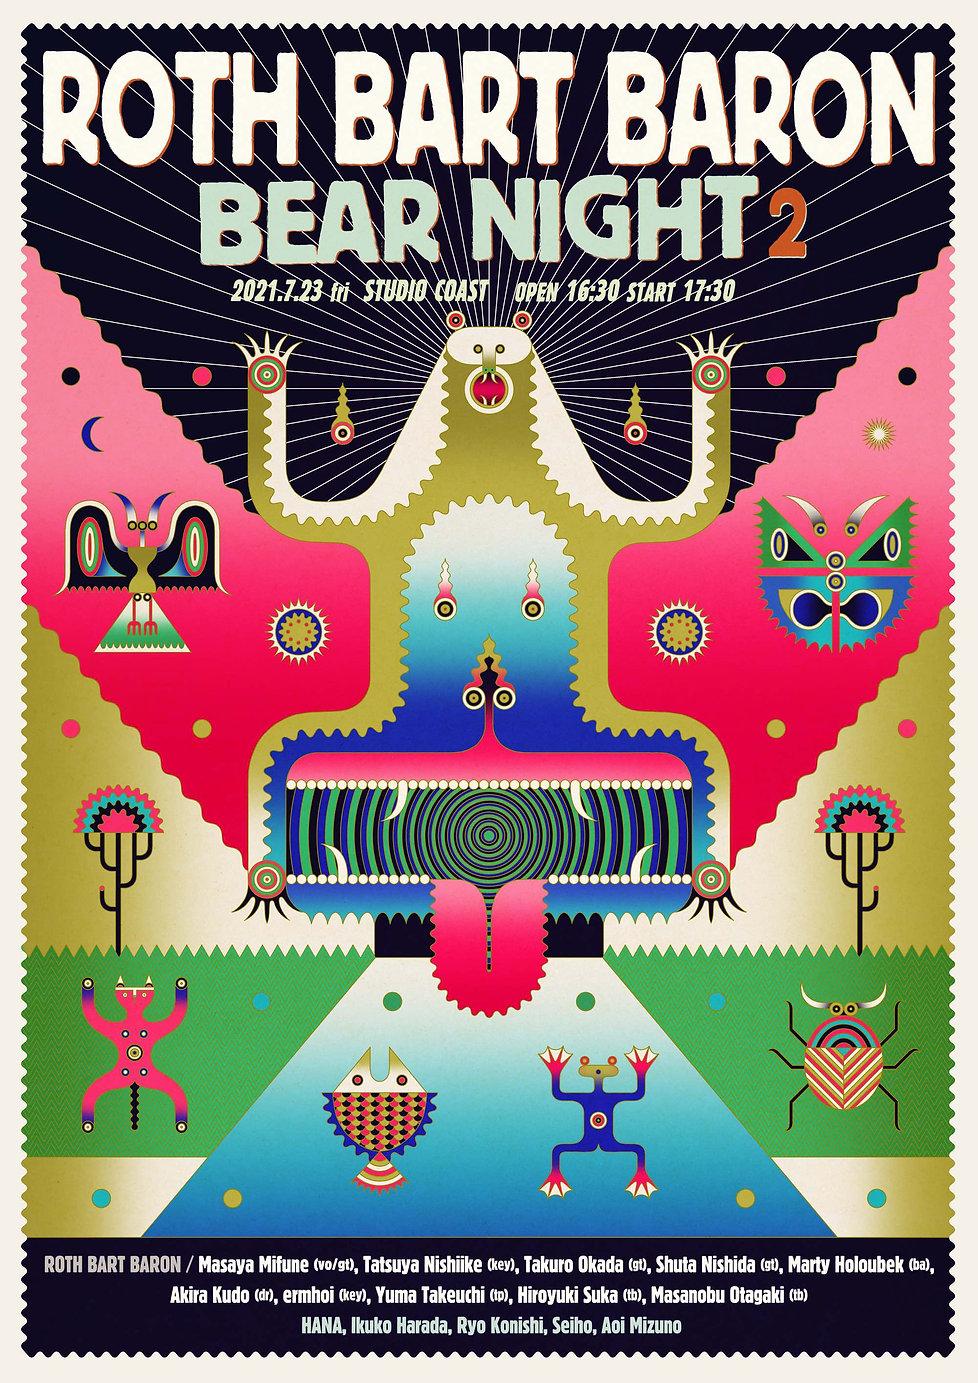 _bearnight_2_title.jpg